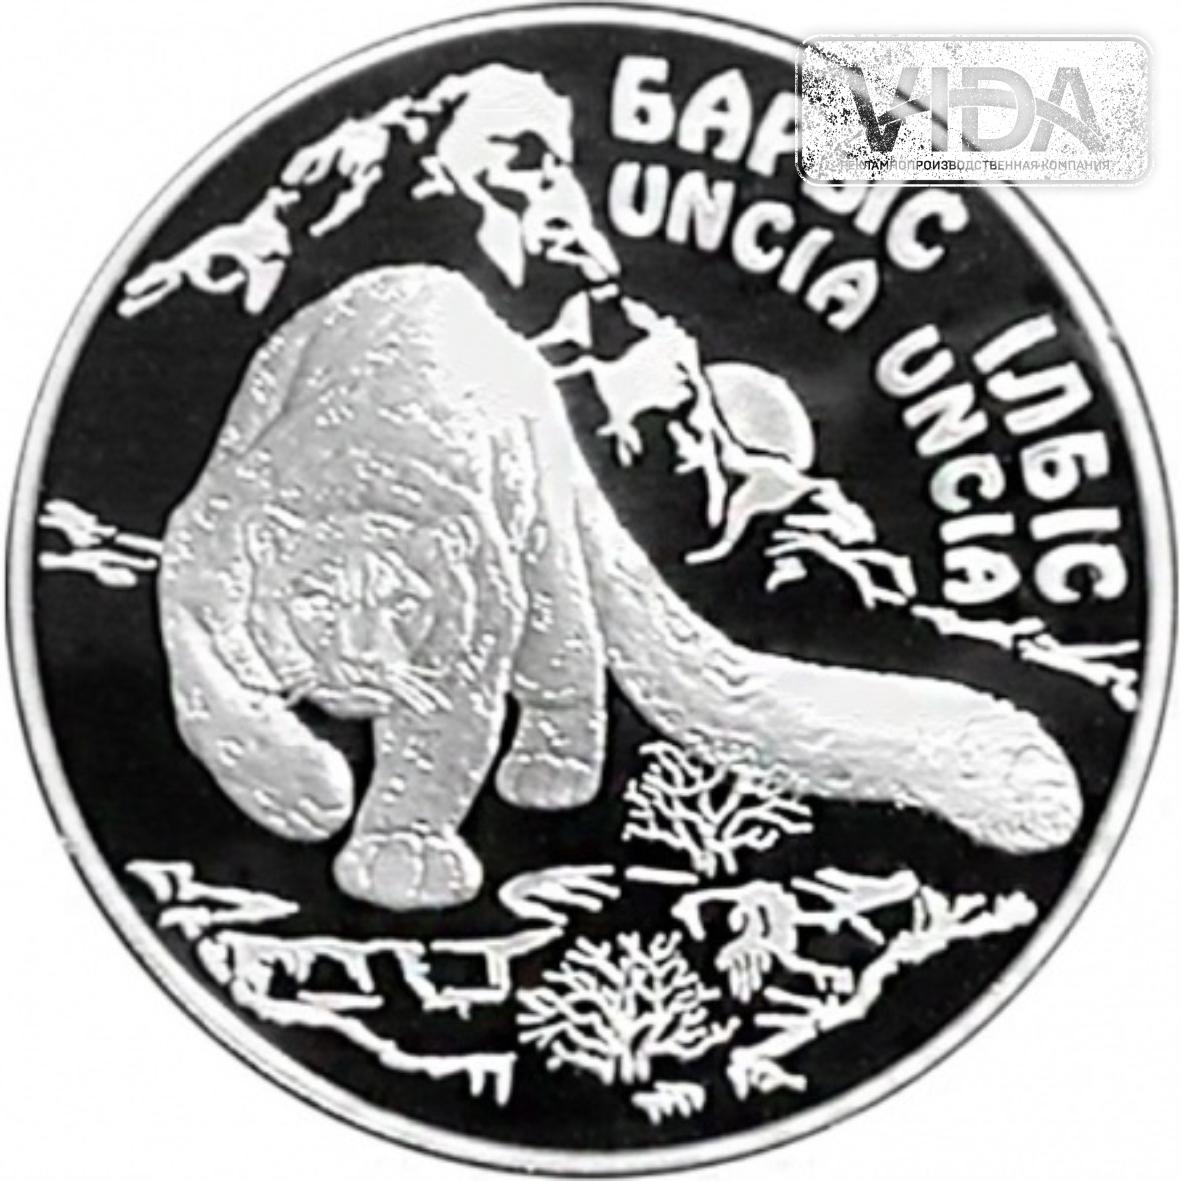 Снежный барс - 500 тенге (Серебро 925)